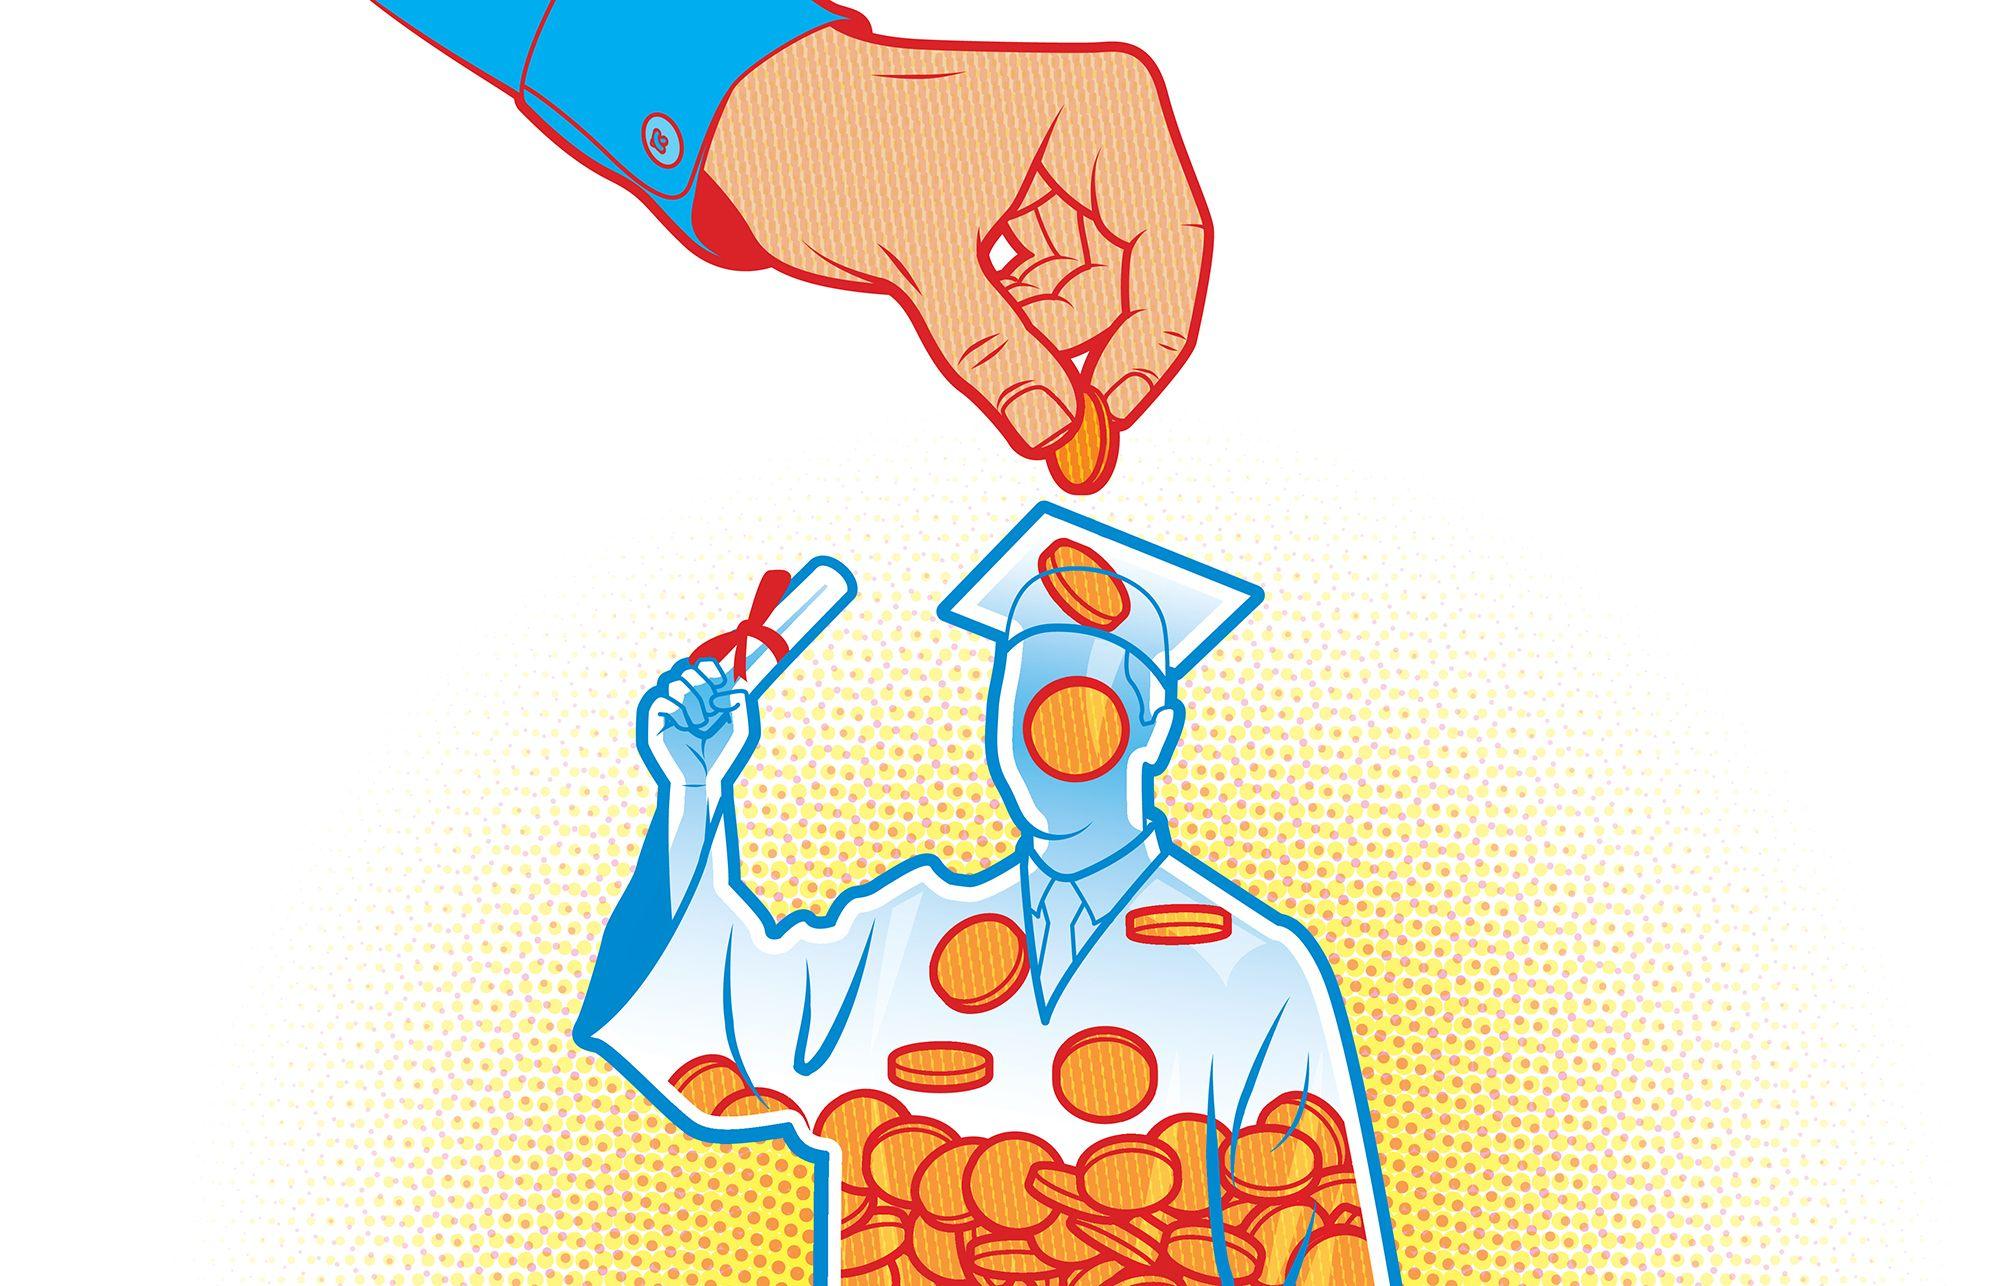 PER_Student Loans_01_170068831